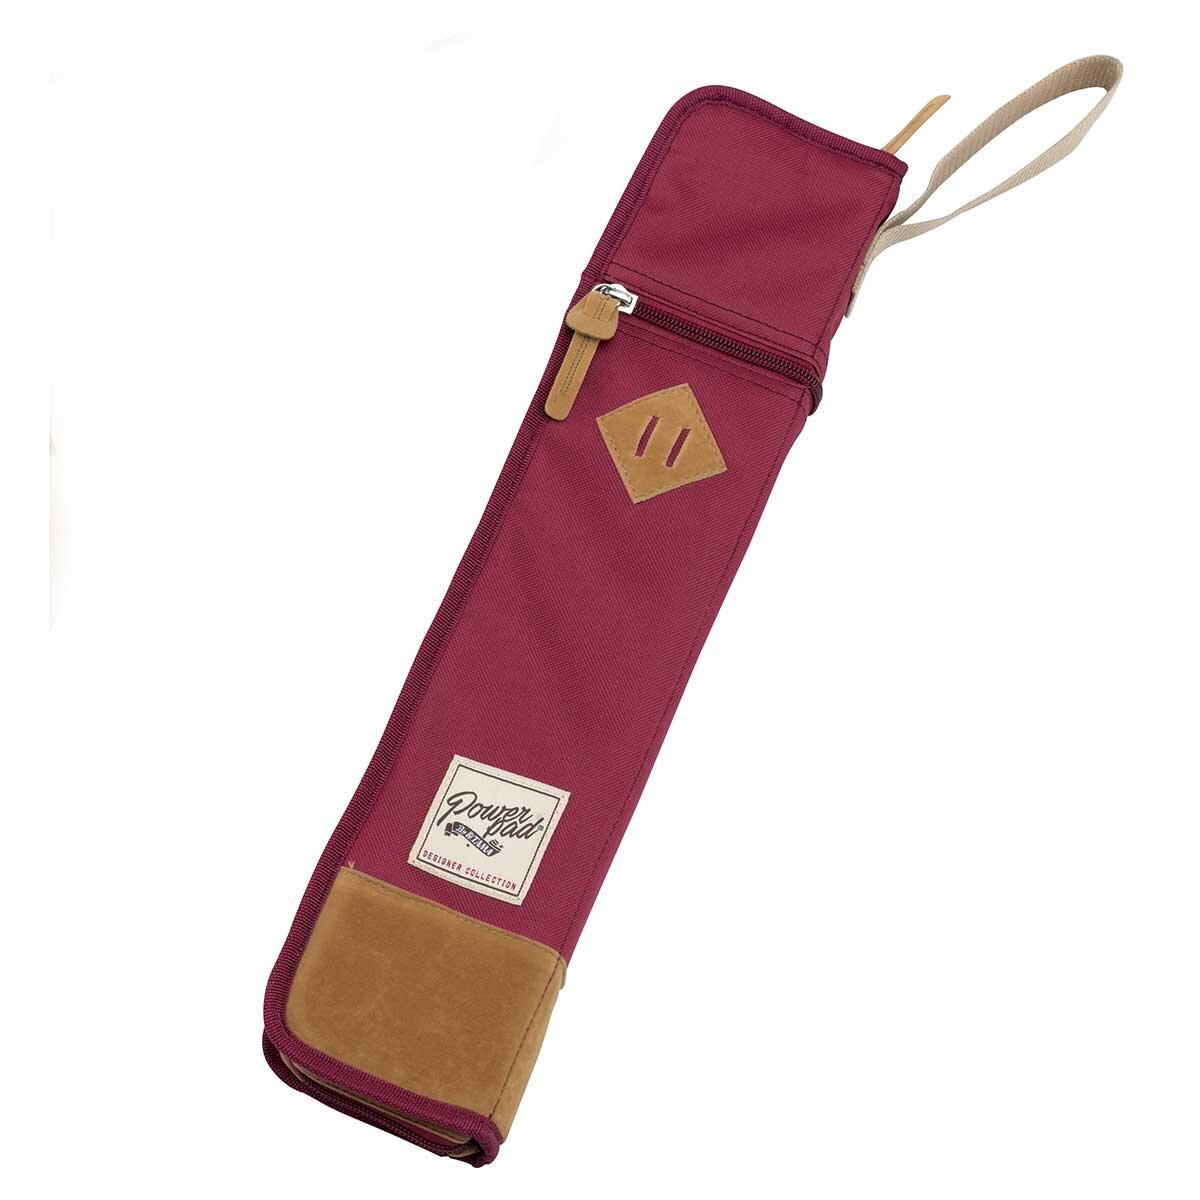 Tama TSB12WR PowerPad Stick Bag Wine Red : photo 1